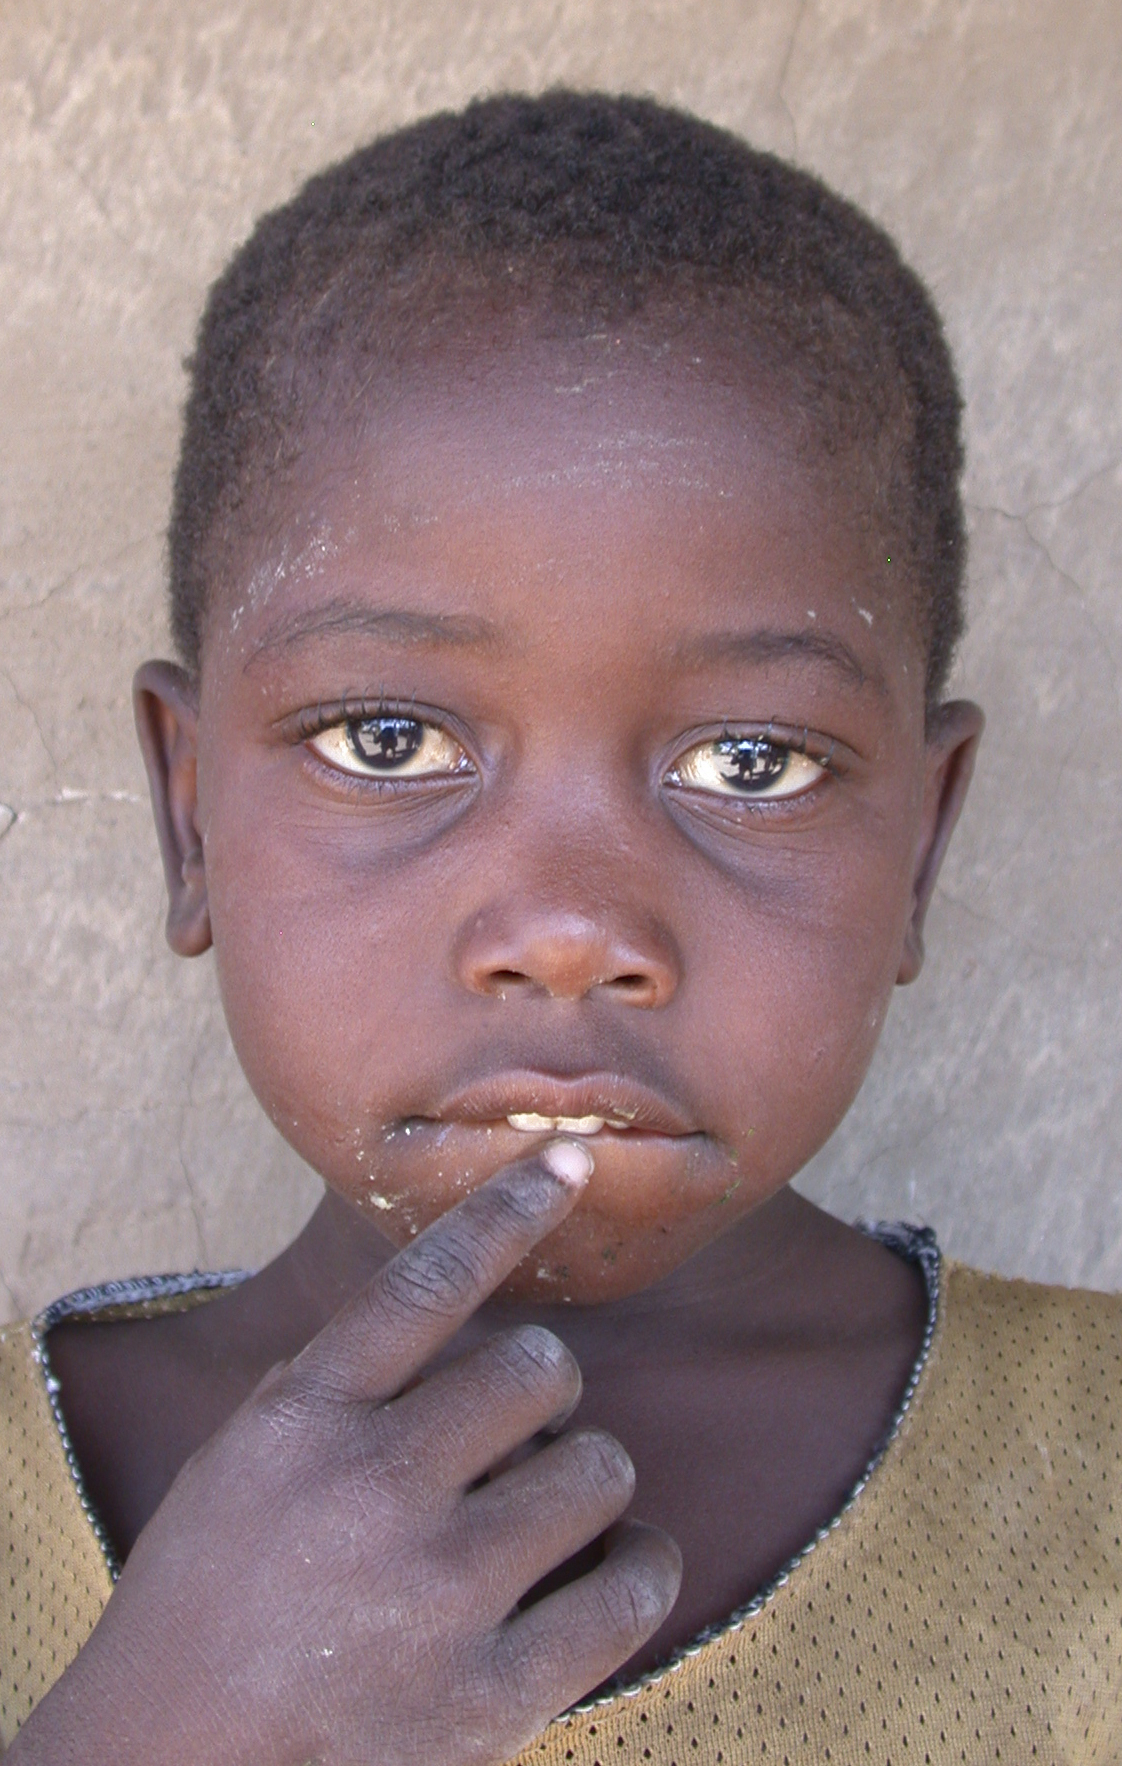 Lozi girl 1 (Zambia 2005)